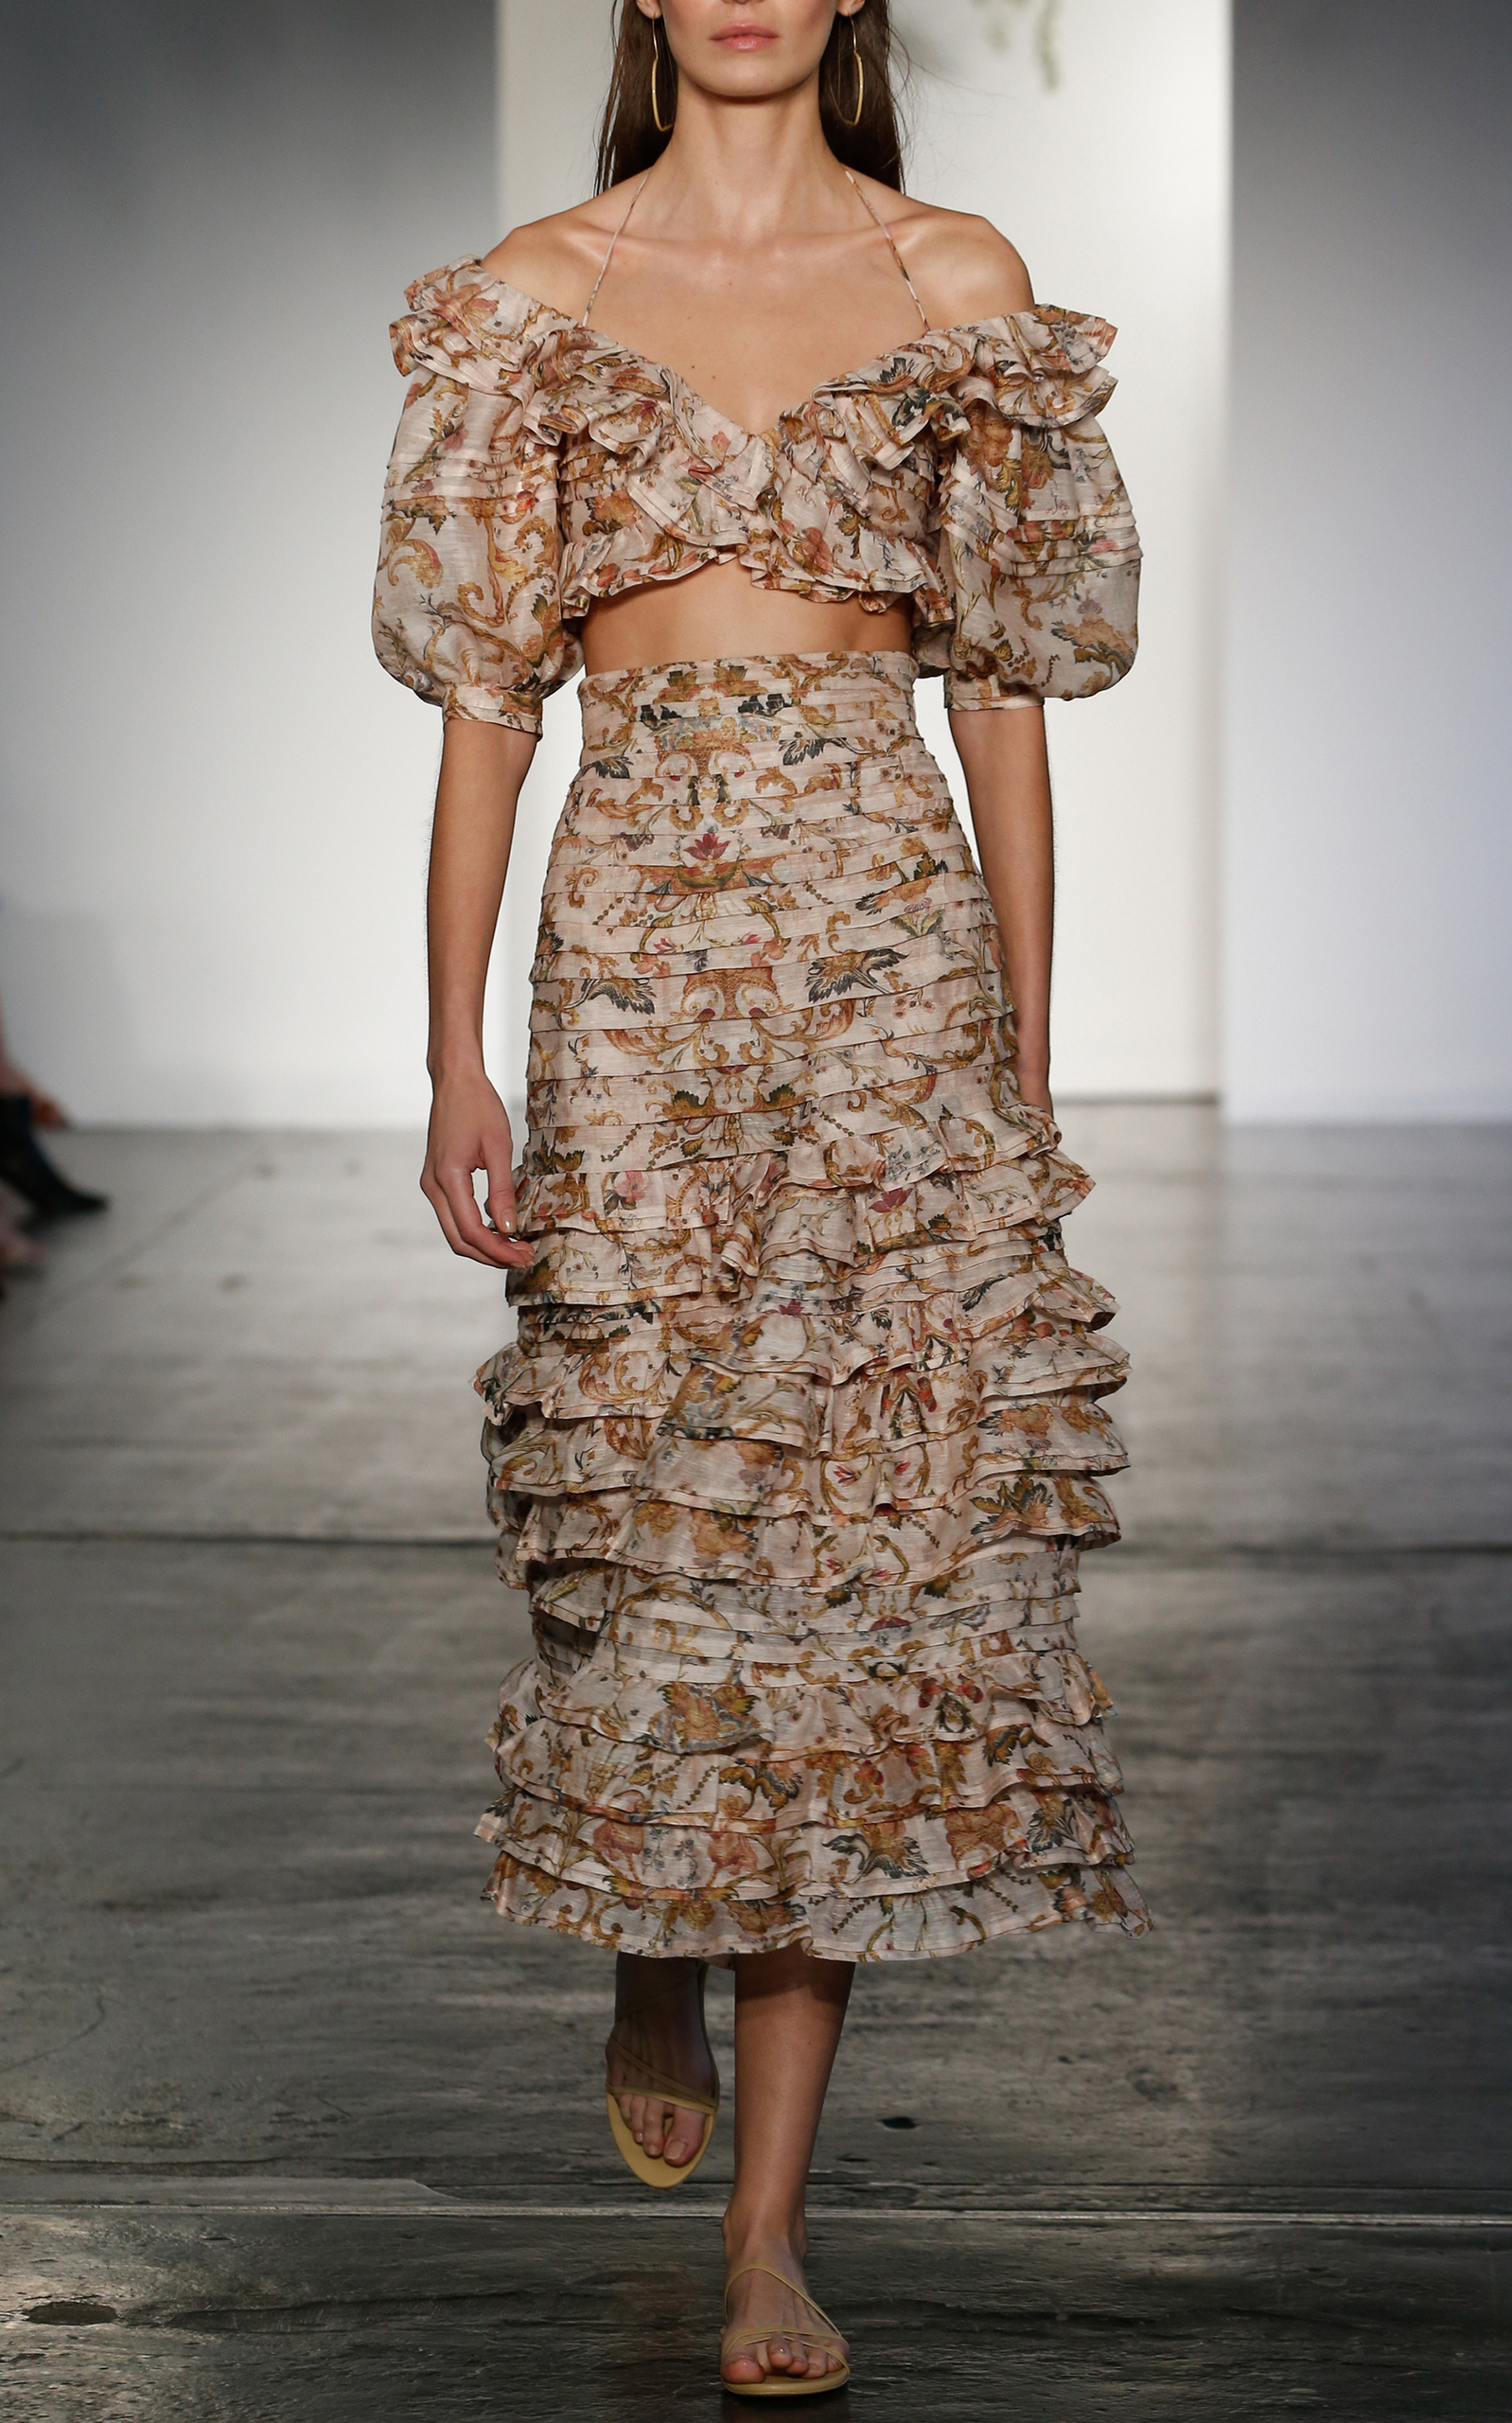 Heart Bodice Dress